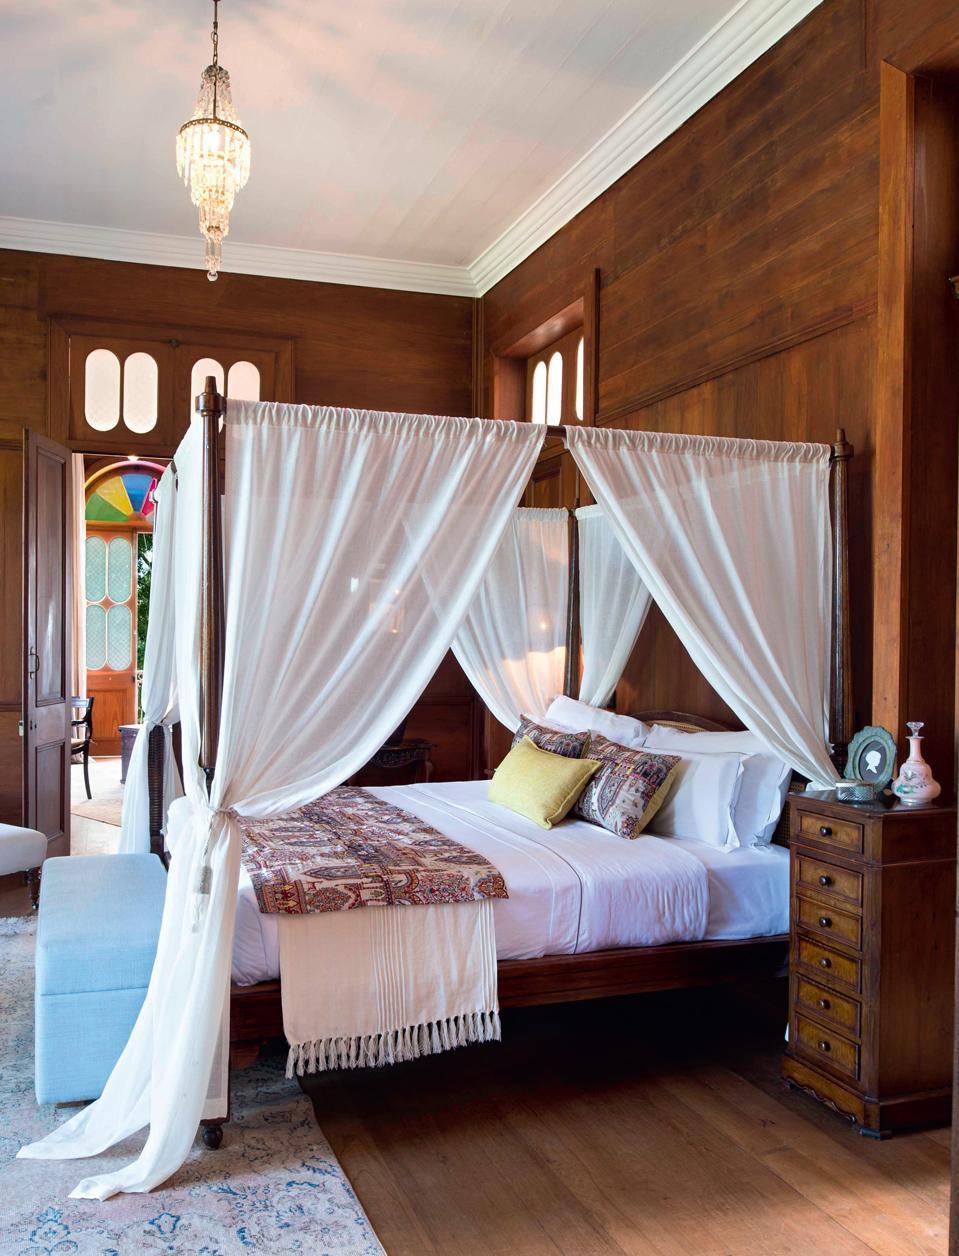 Baldakin över sängen i engelsk stil